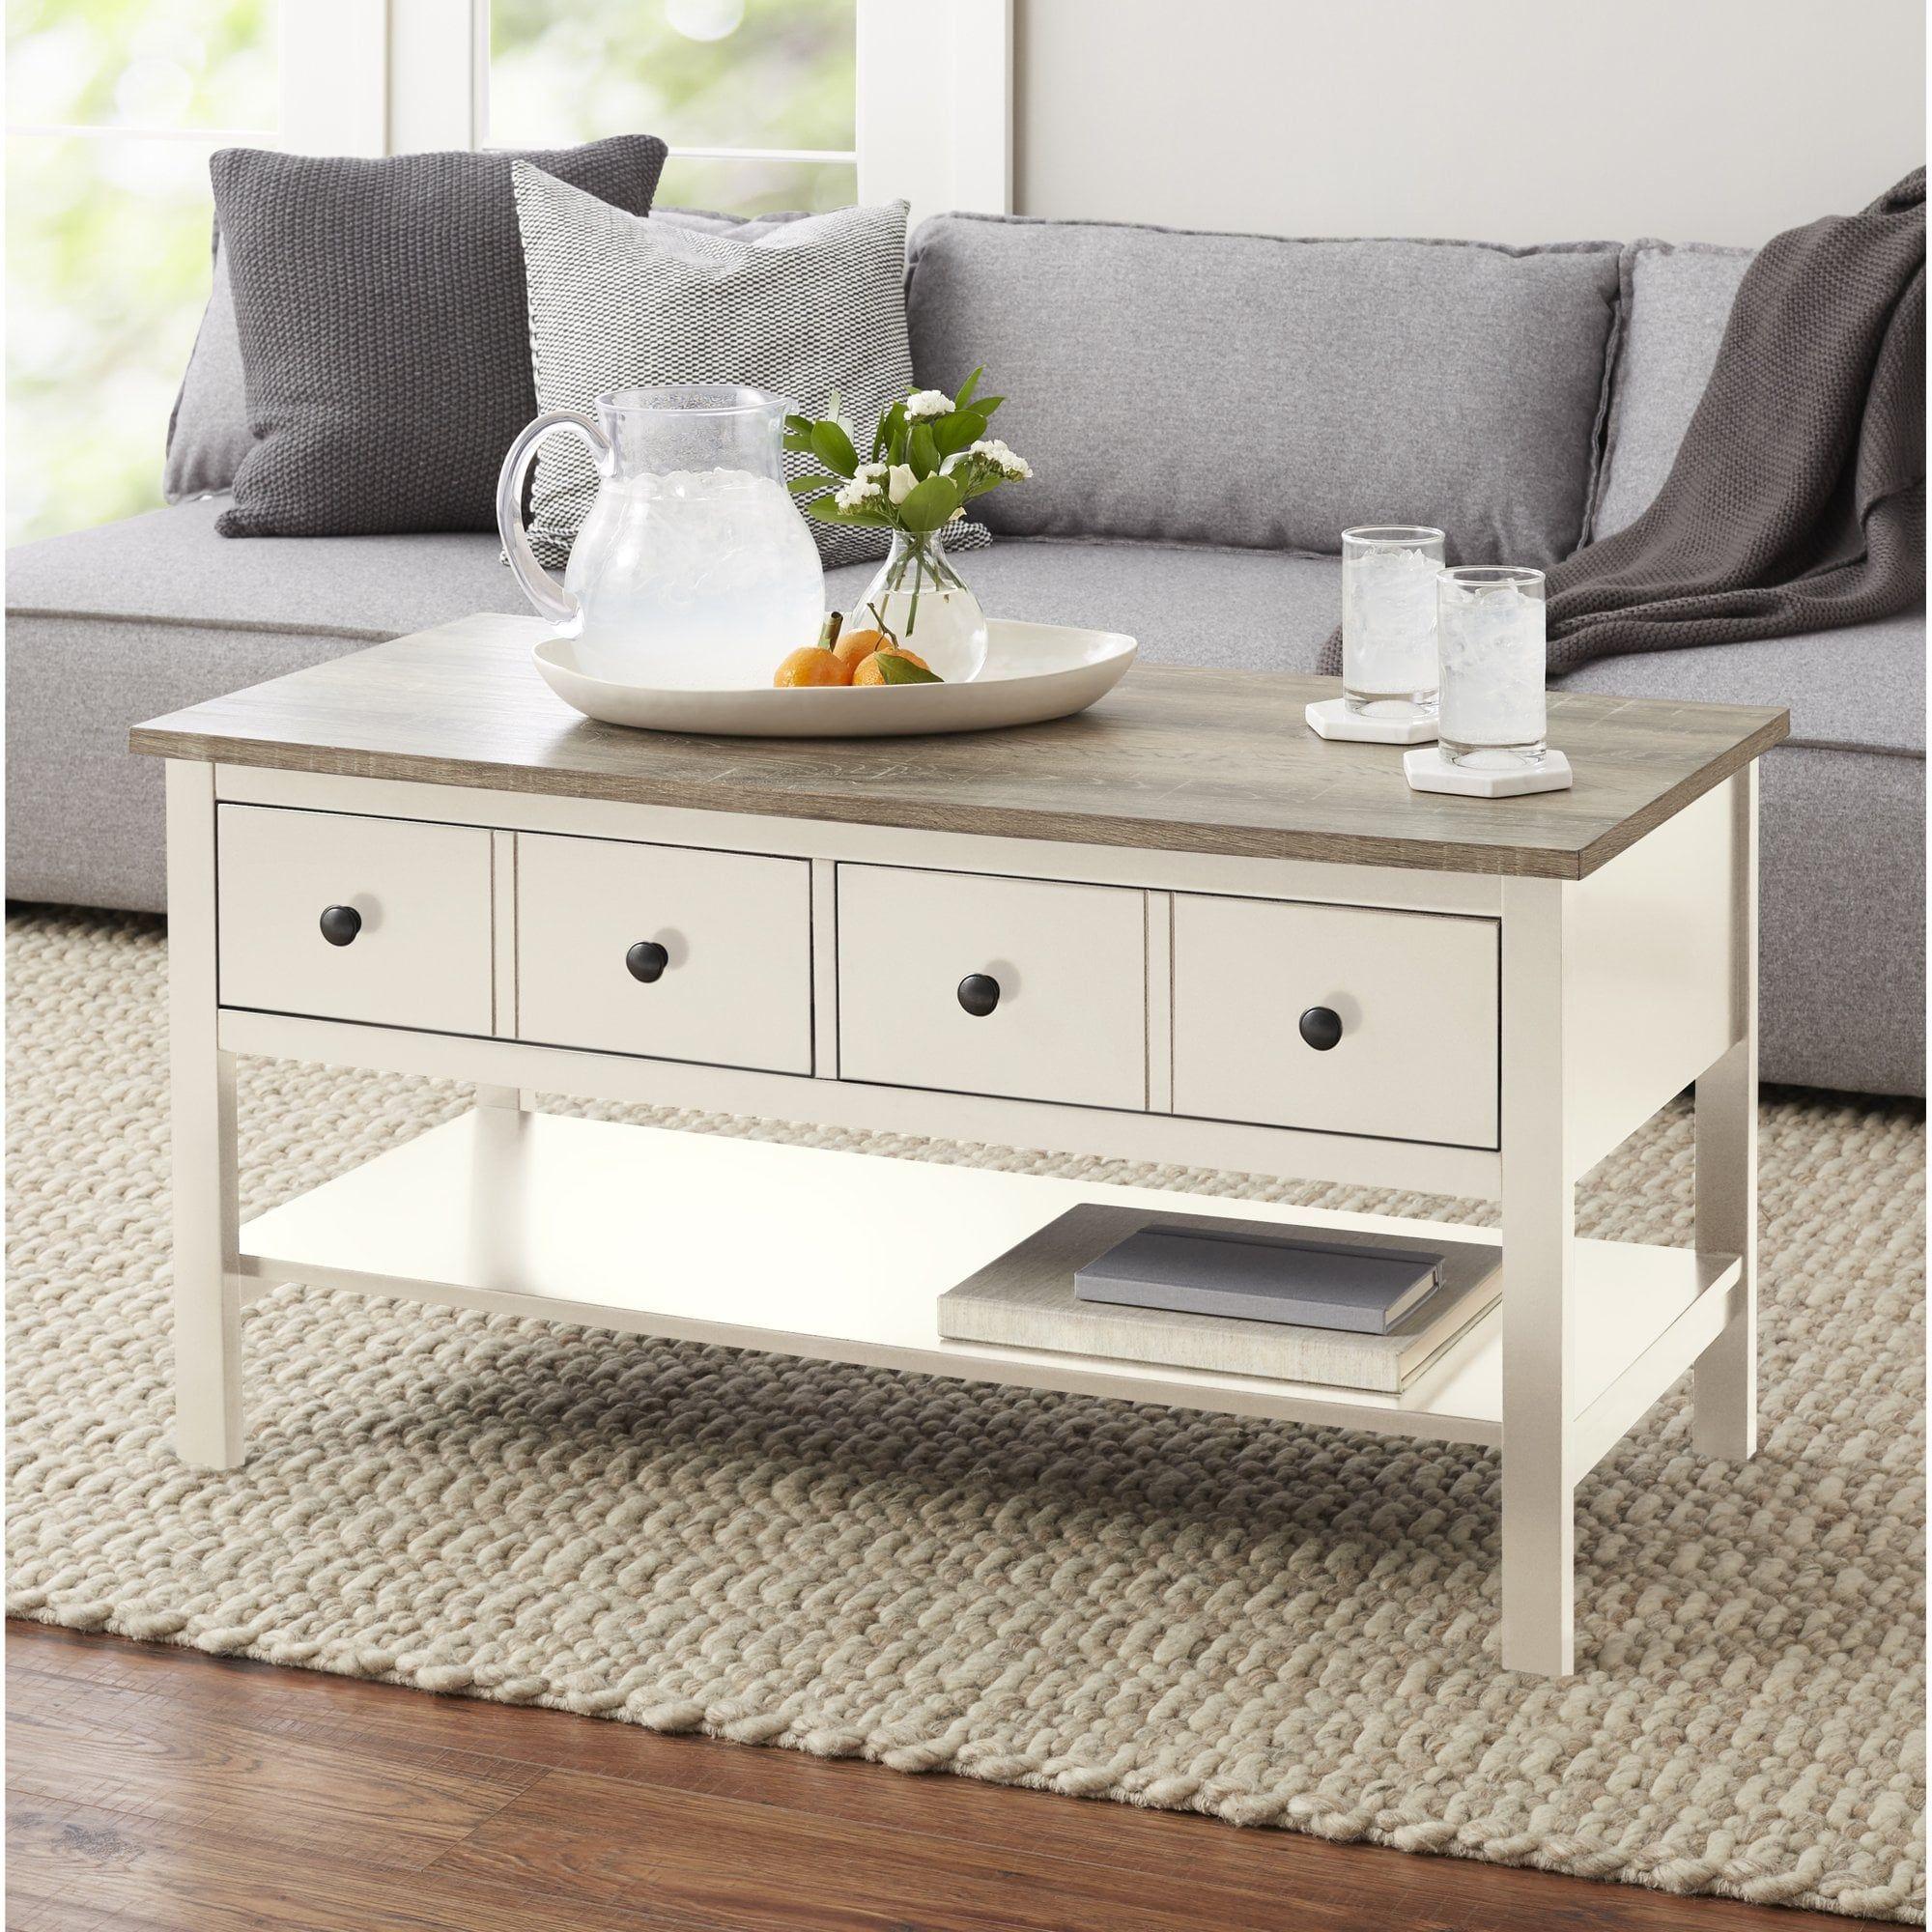 Ameriwood Home Farmington Coffee Table Coffee table